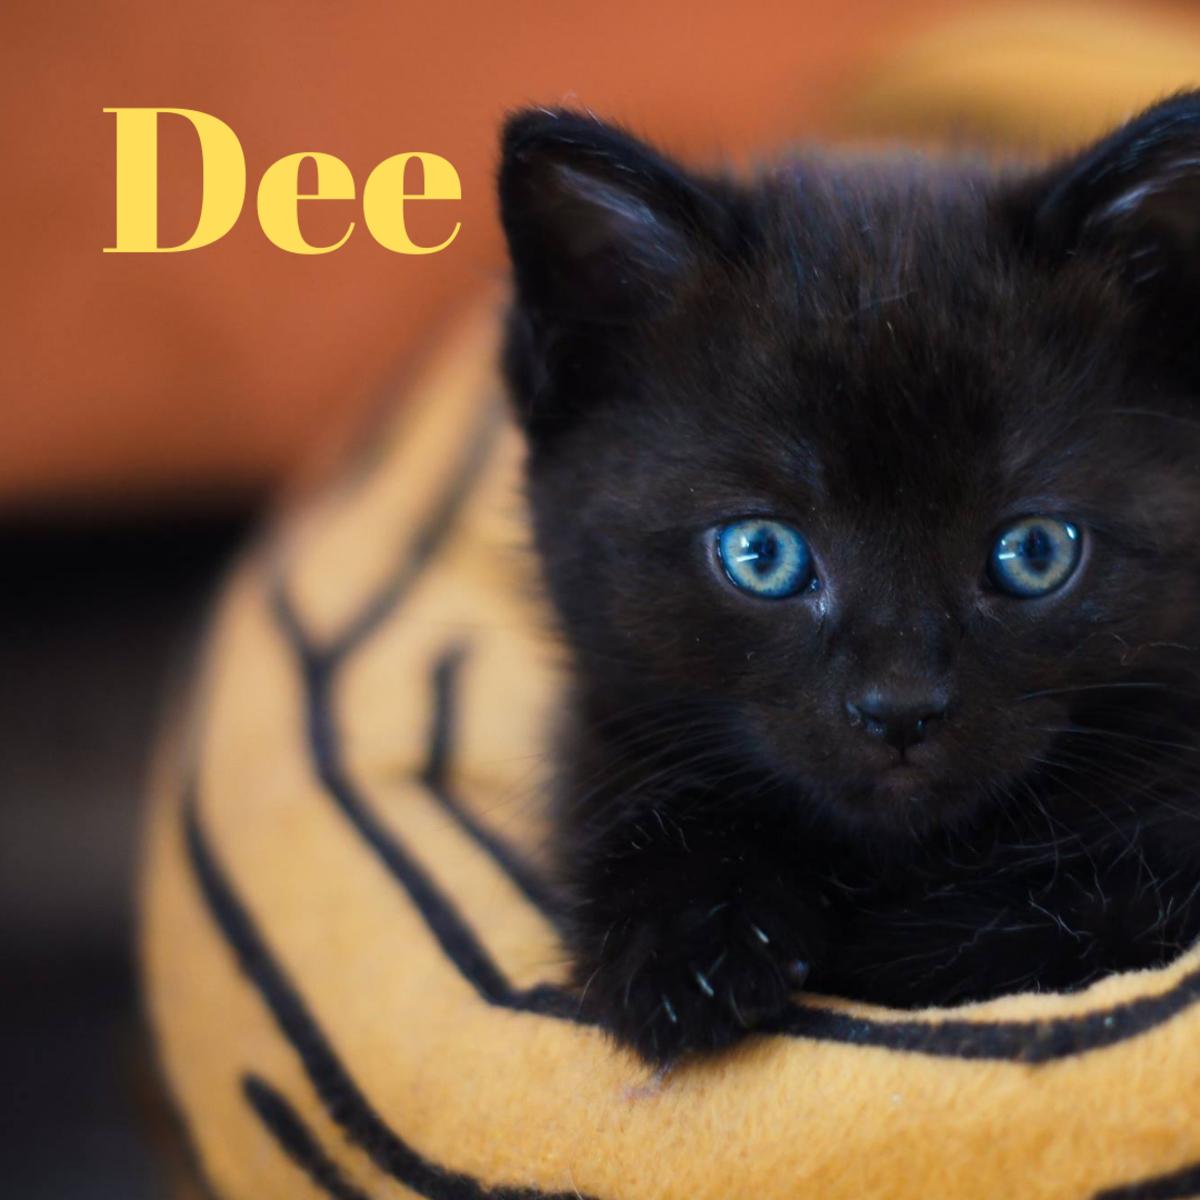 A kitten named Dee